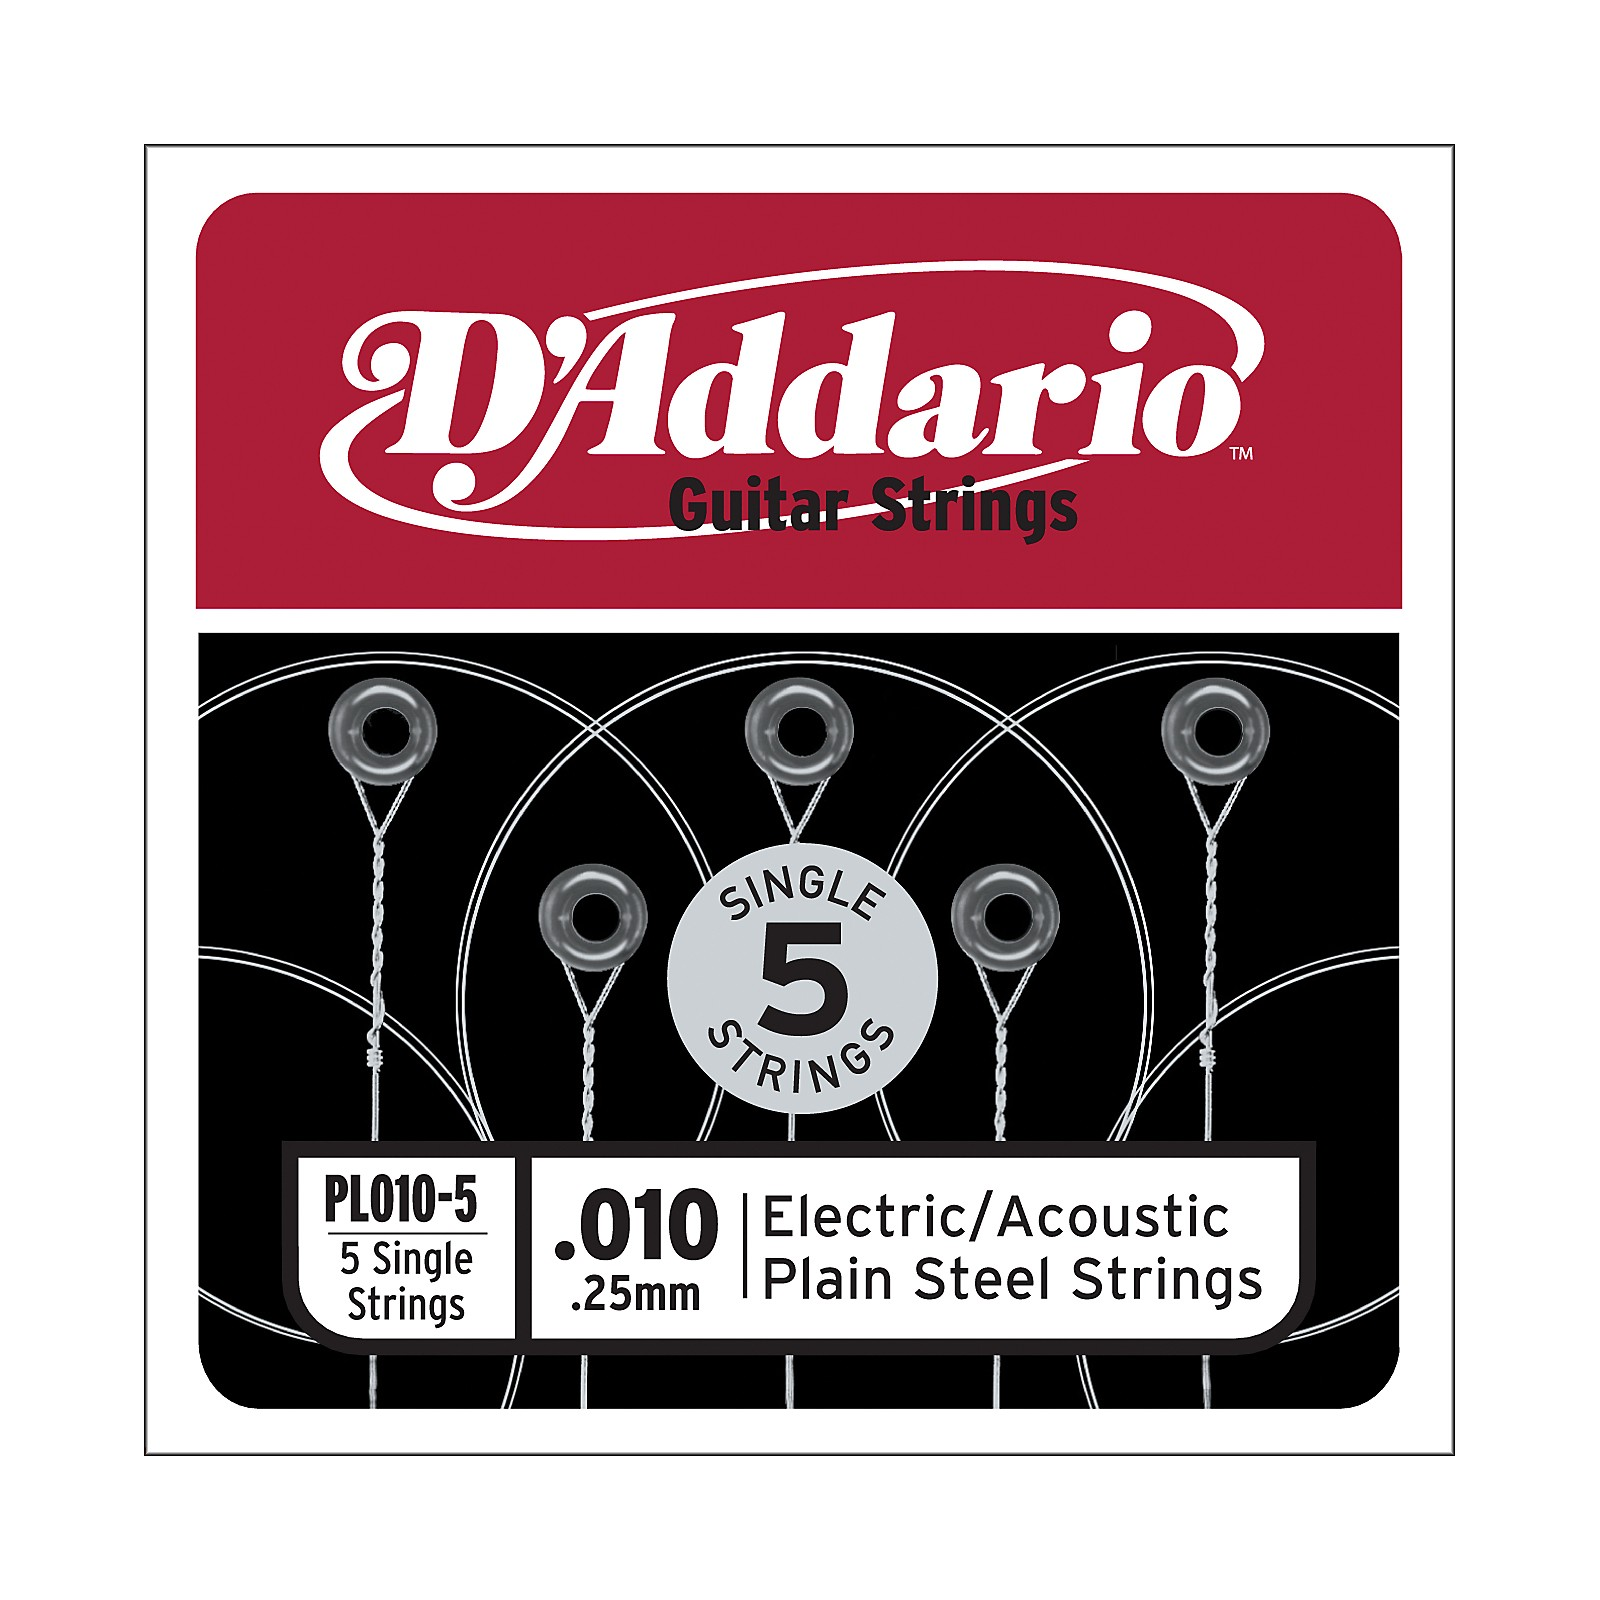 D'Addario PL010-5 Strings